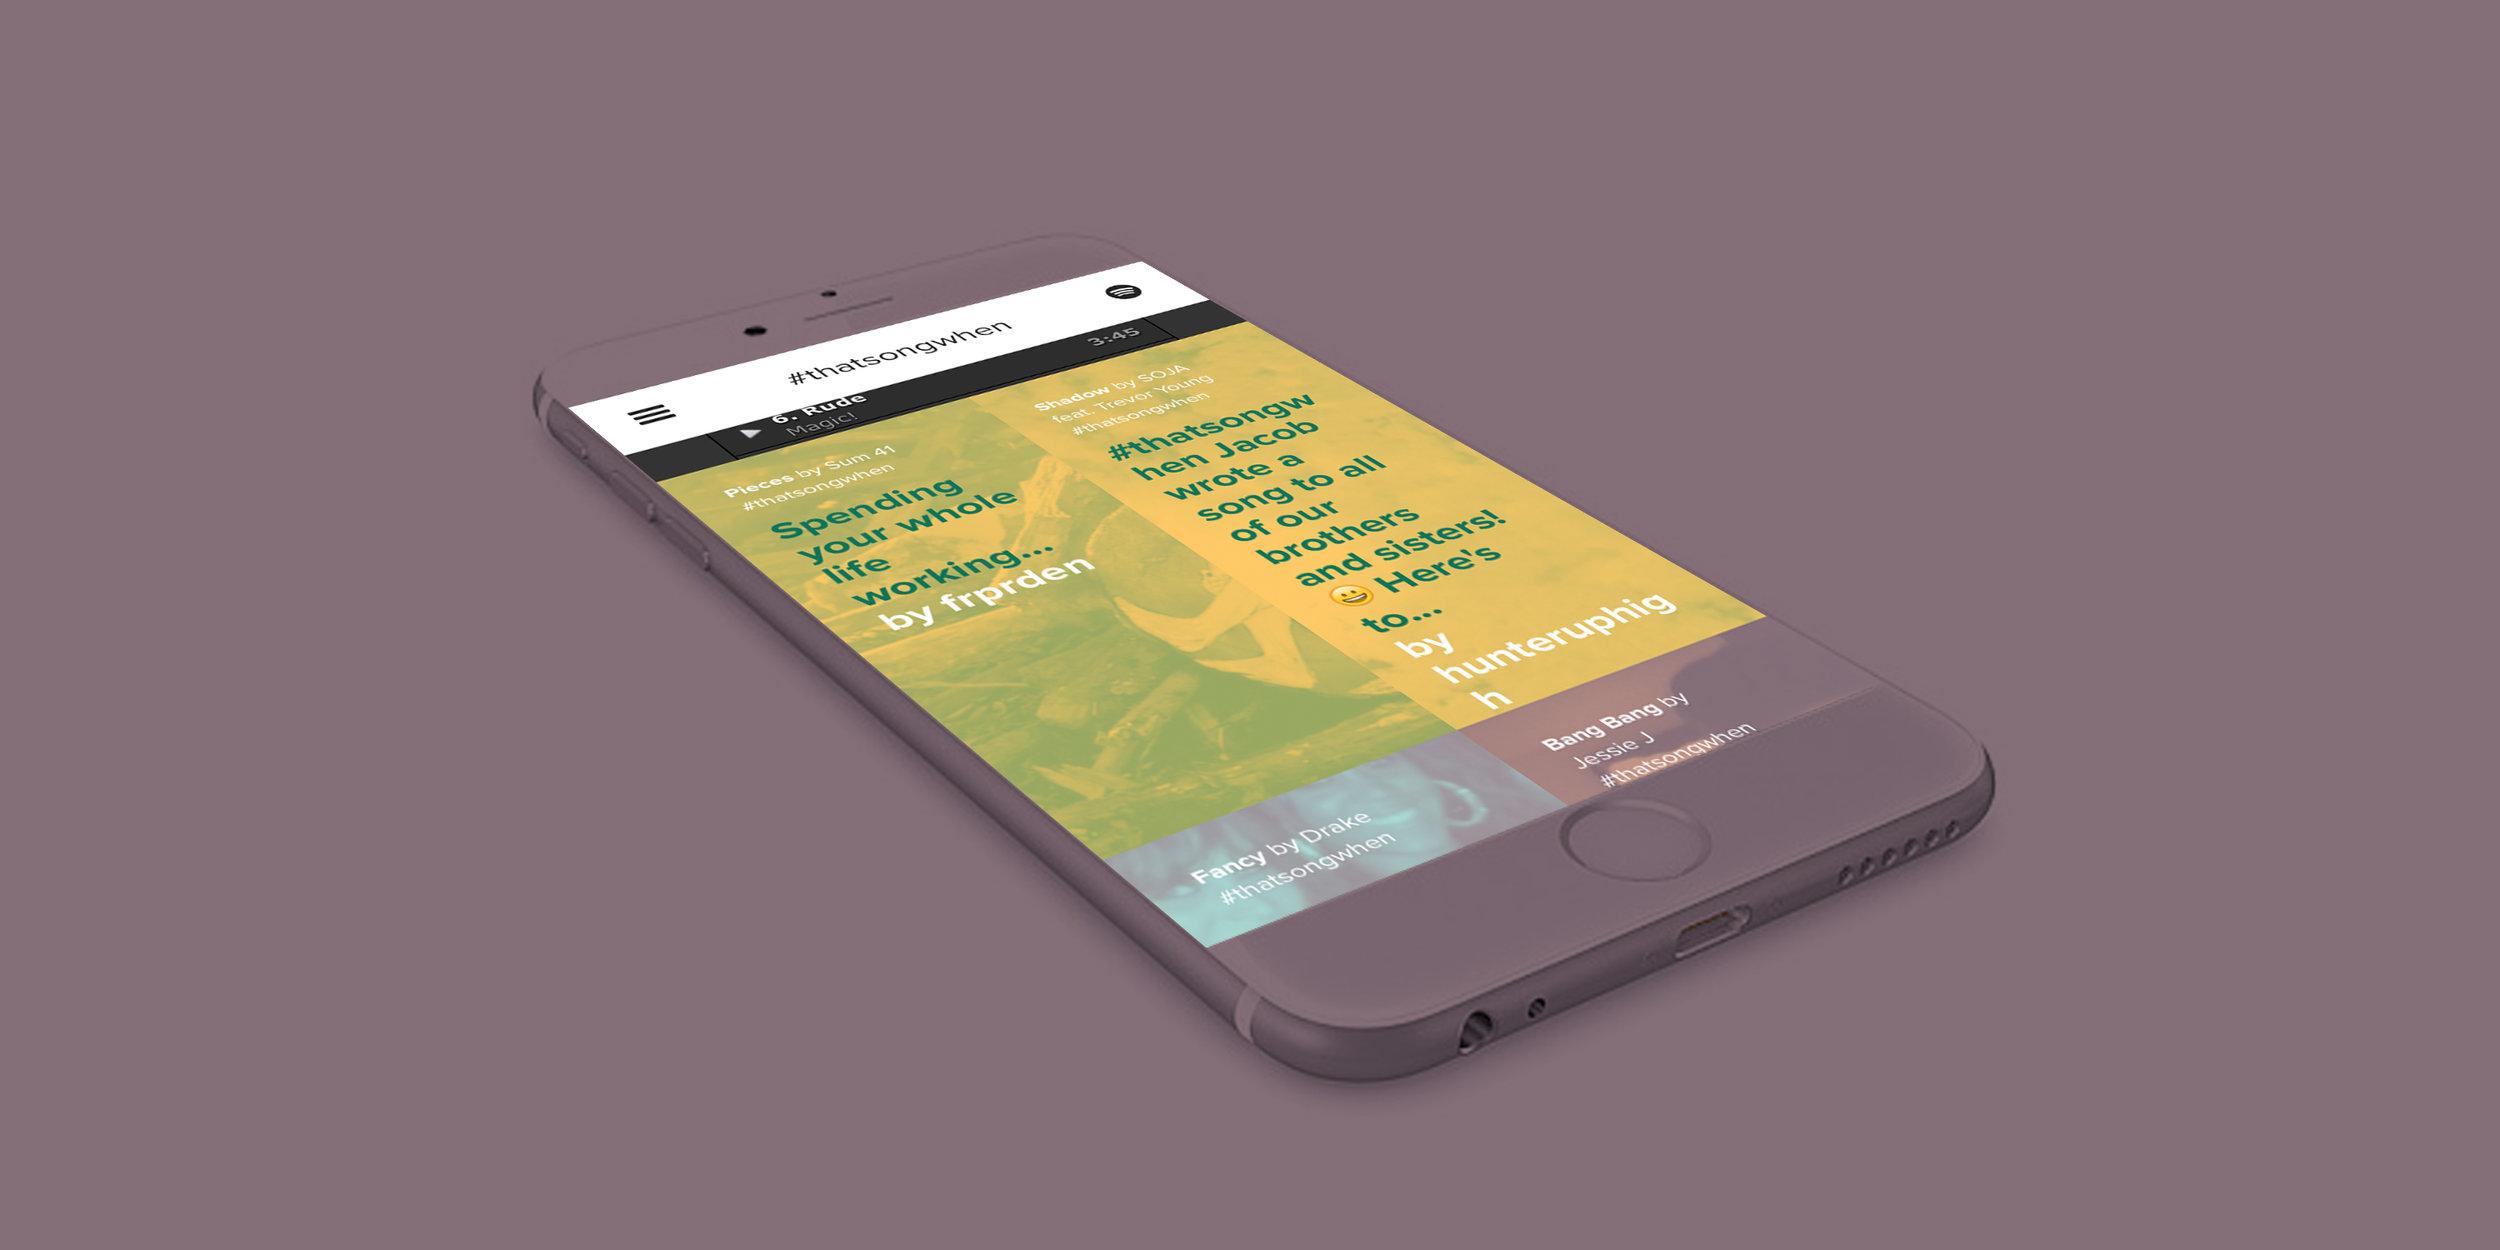 Spotify-thatsongwhen-mobile-phone.jpg